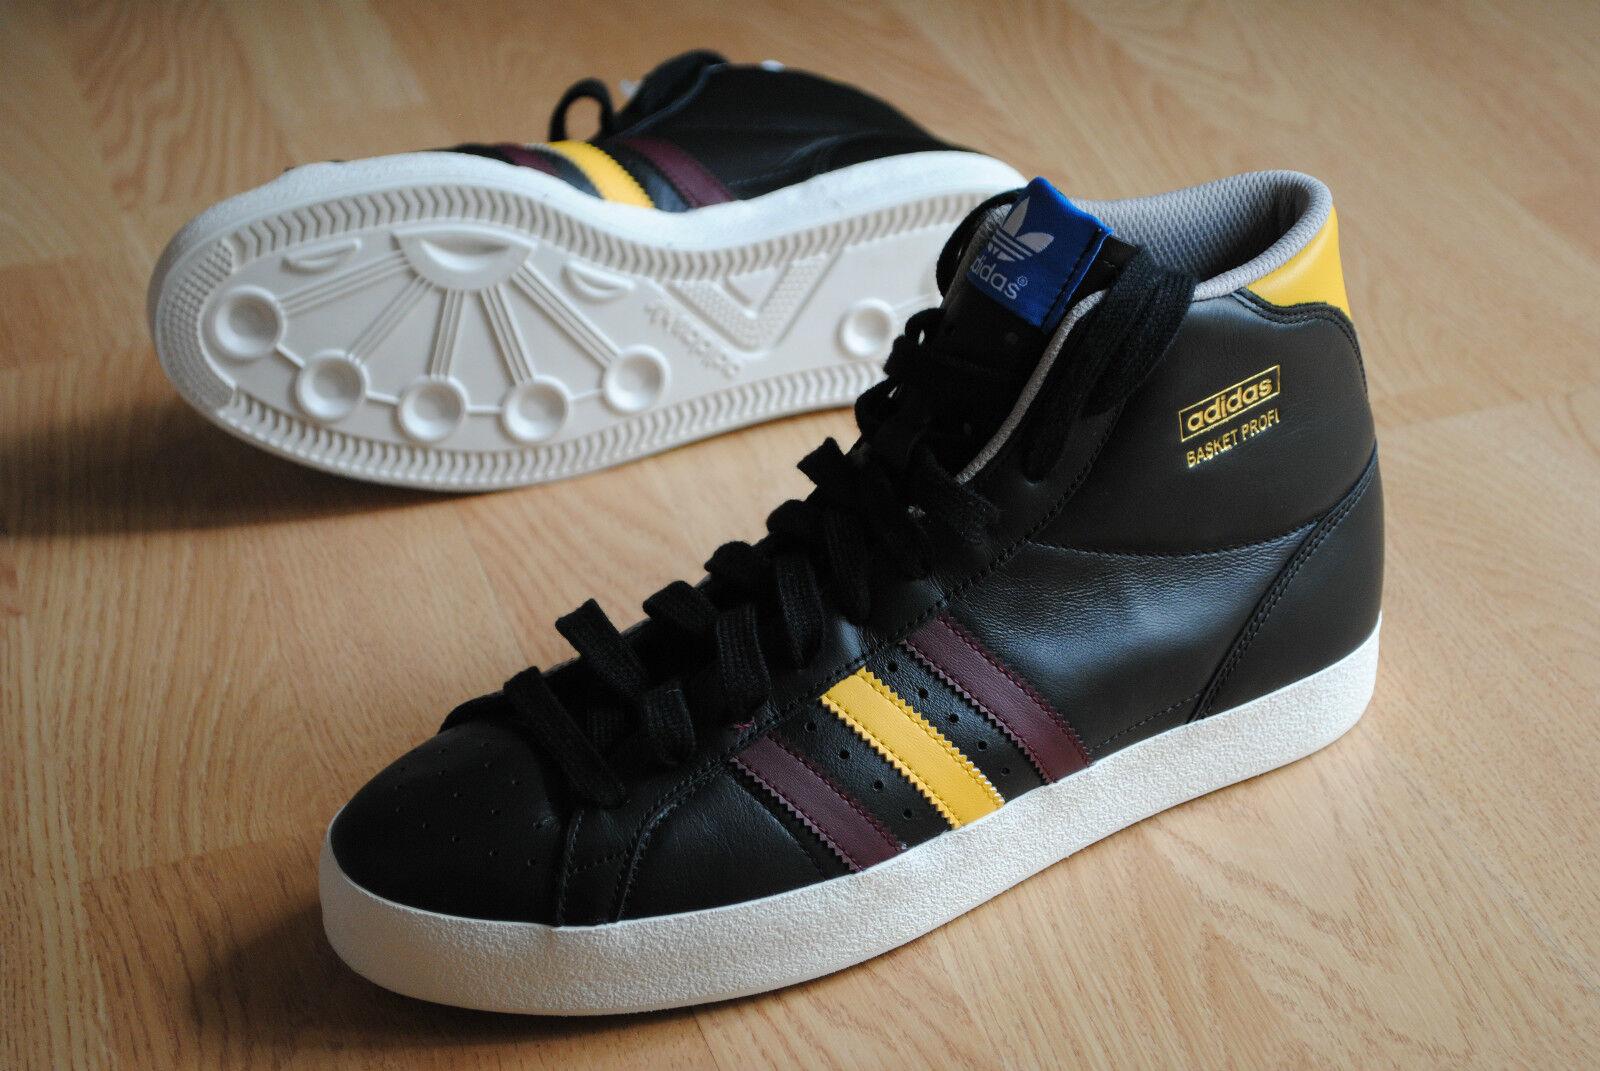 adidas basket profi 40,5 41   Vintage campUs reKorD supeRstar kiCk promodel